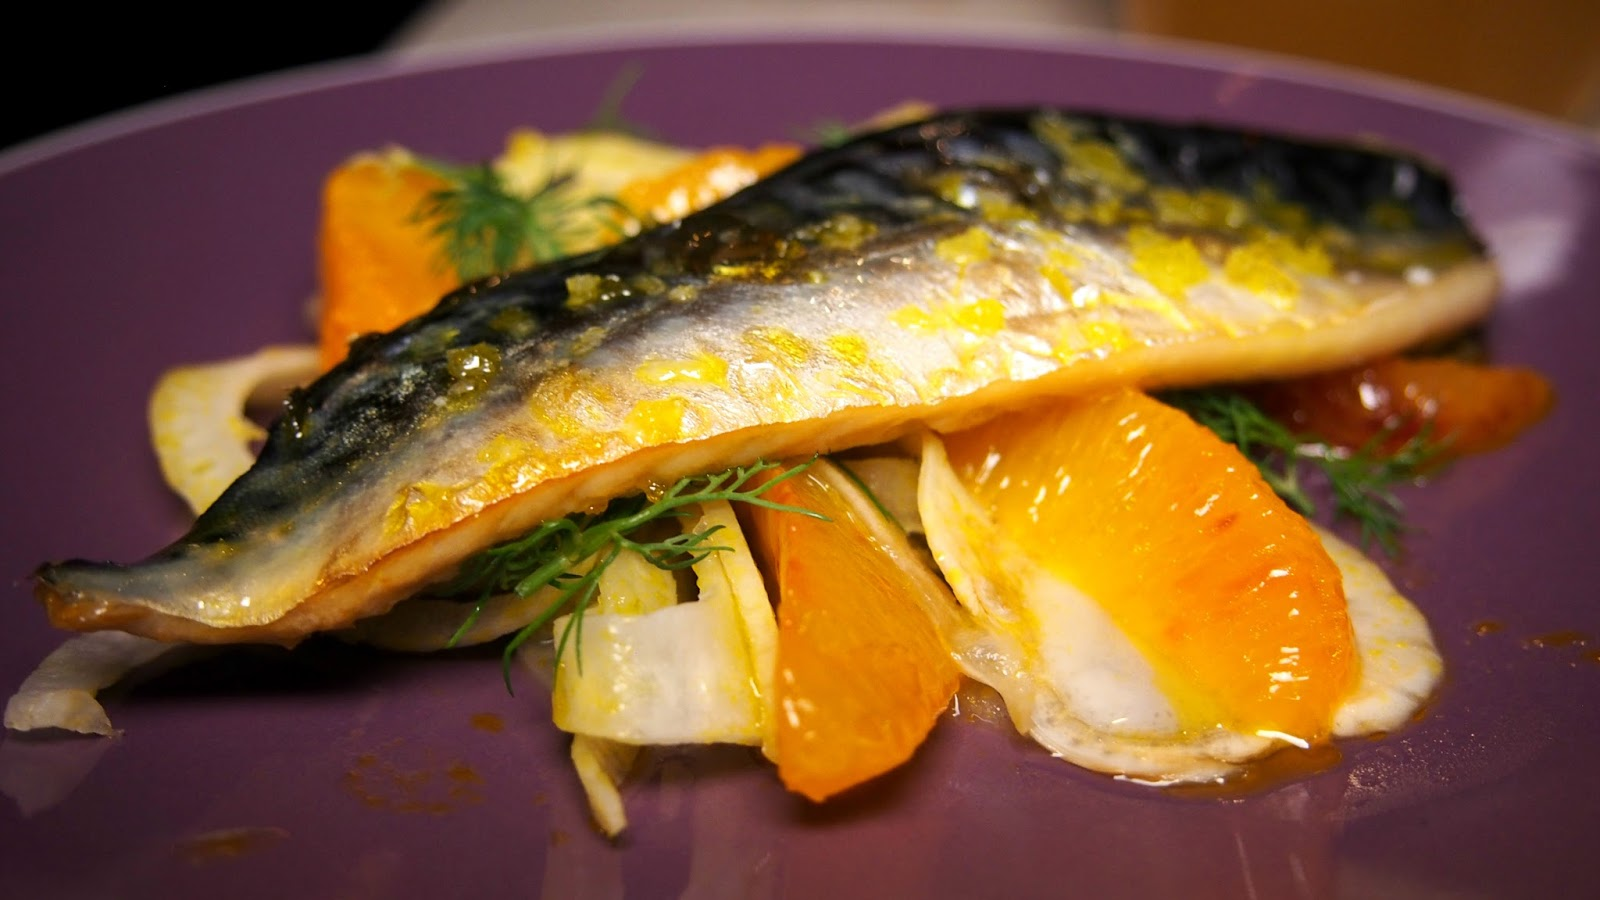 Mackerel with orange